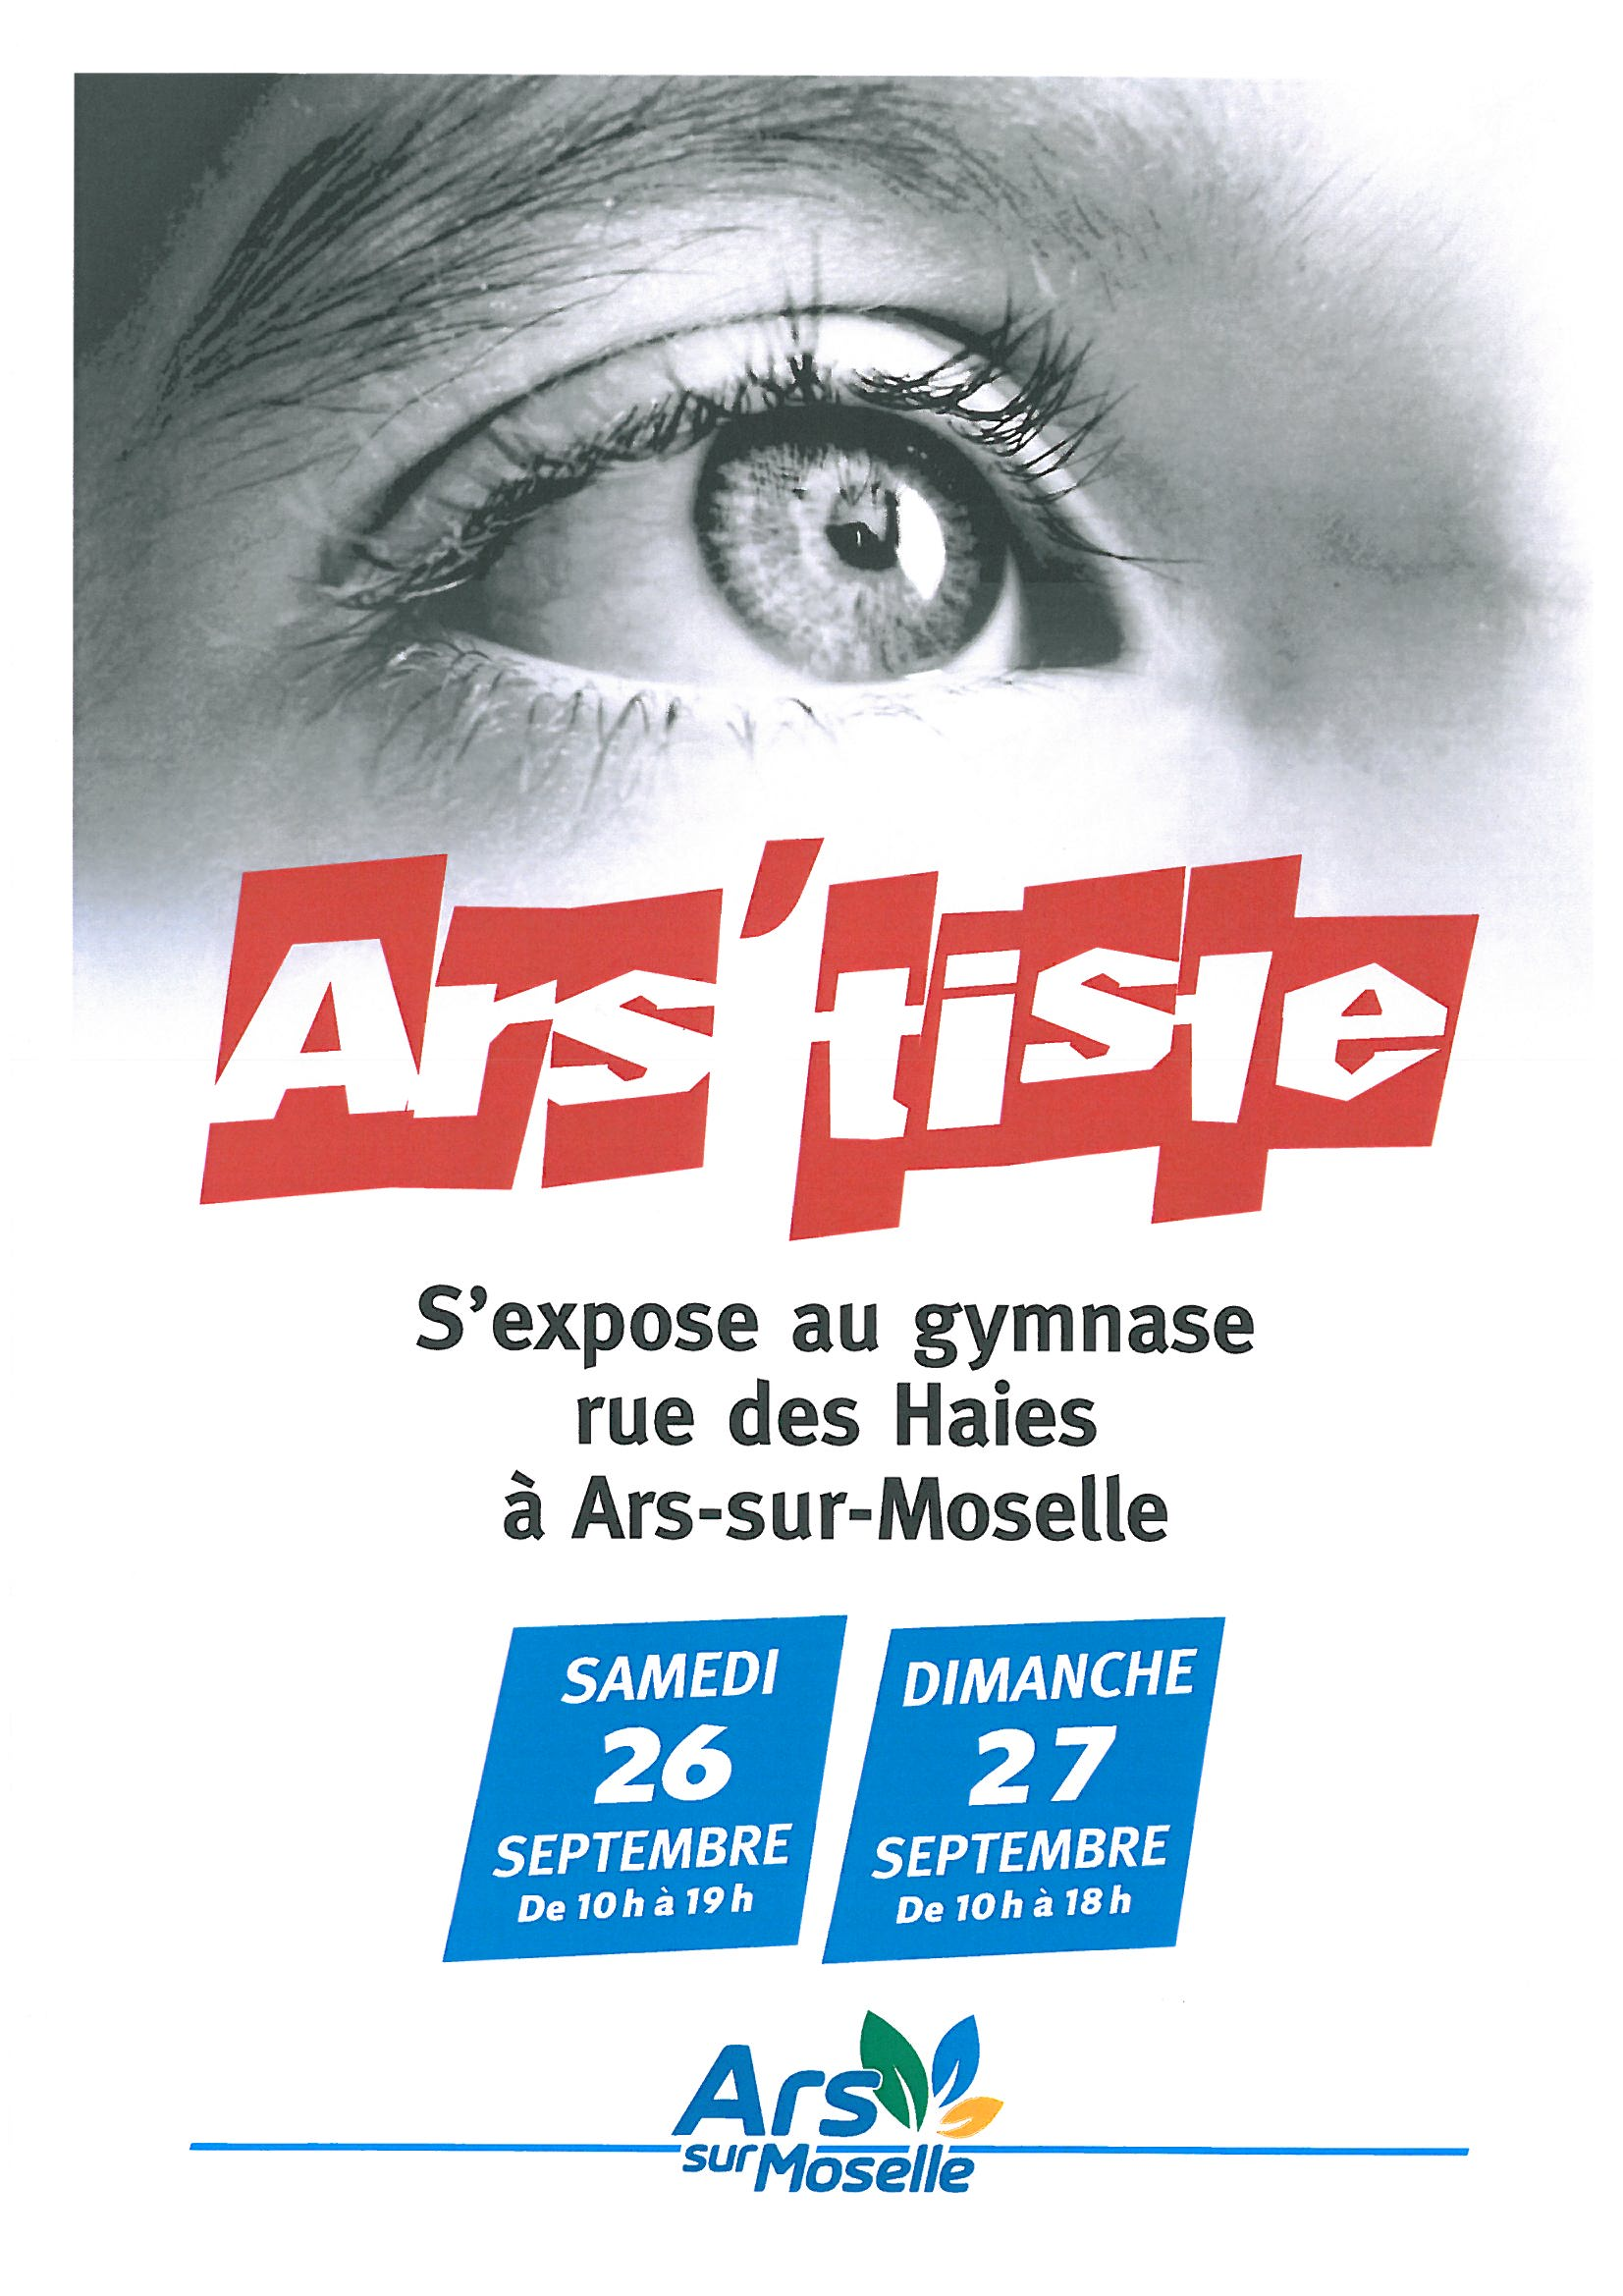 EXPO ARS'TISTE samedi 26 et dimanche 27